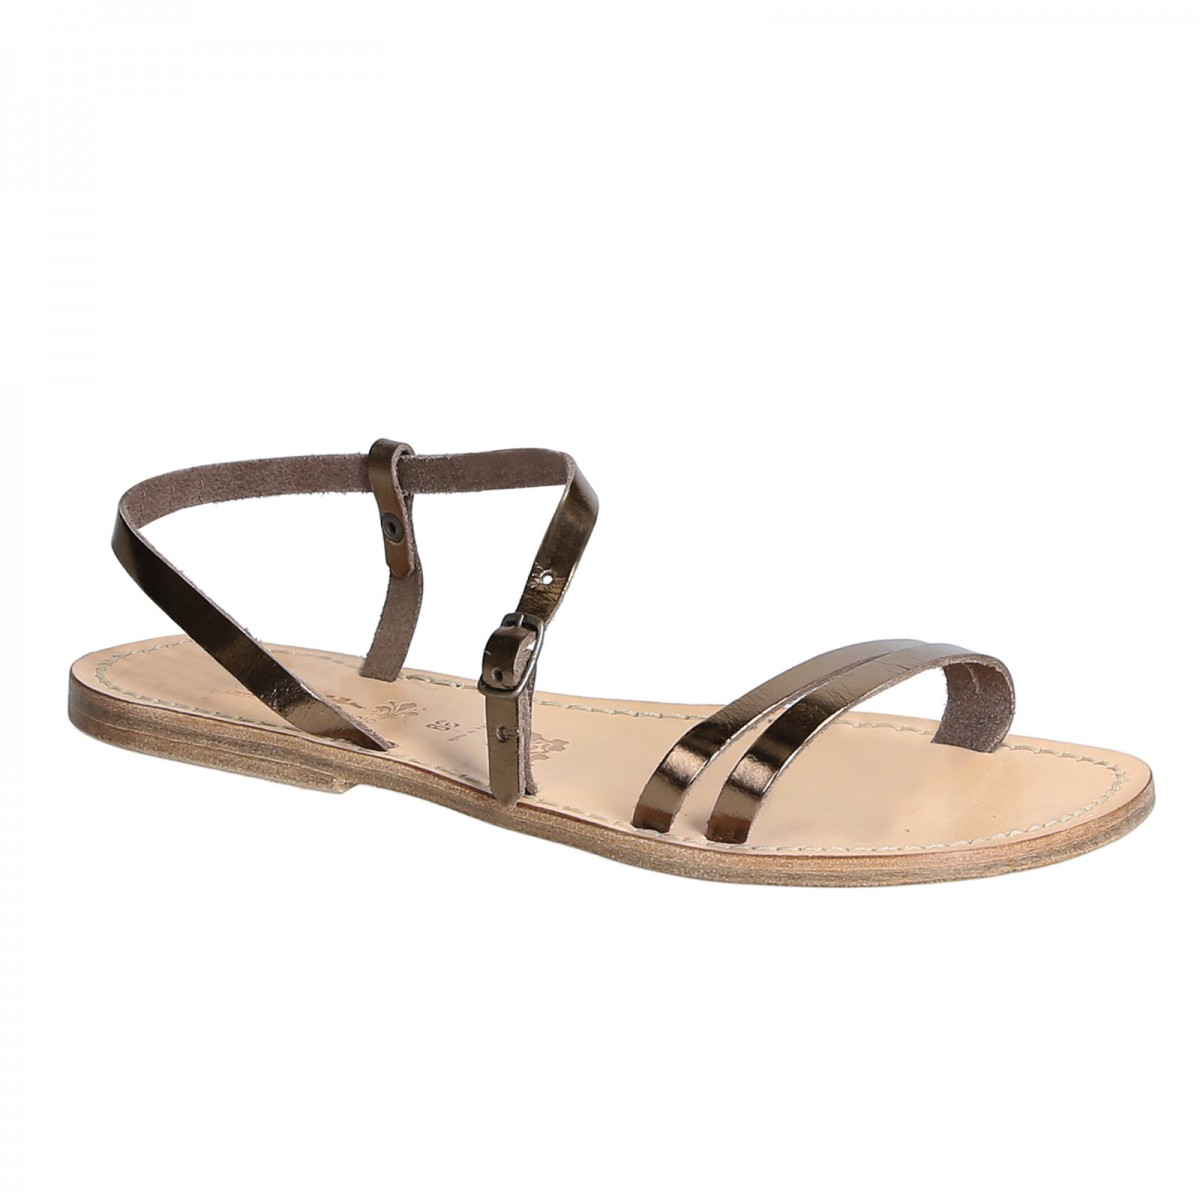 e77a1ce6d0928b handgefertigte-bronze-laminierte-farben-flache-sandalen-fur-damen.jpg